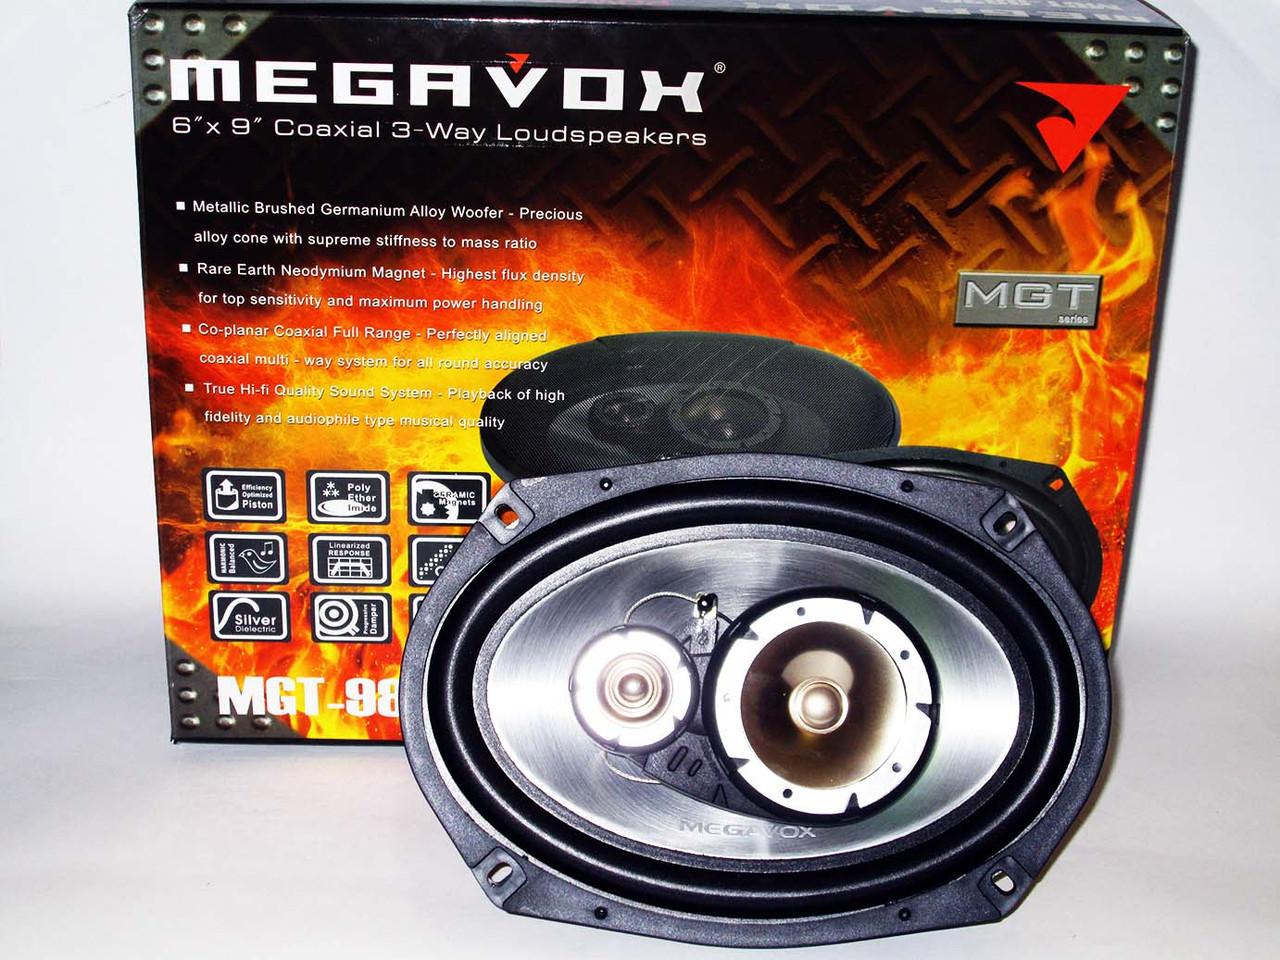 MEGAVOX MGT-9836 6x9 овалы (500W) трехполосные